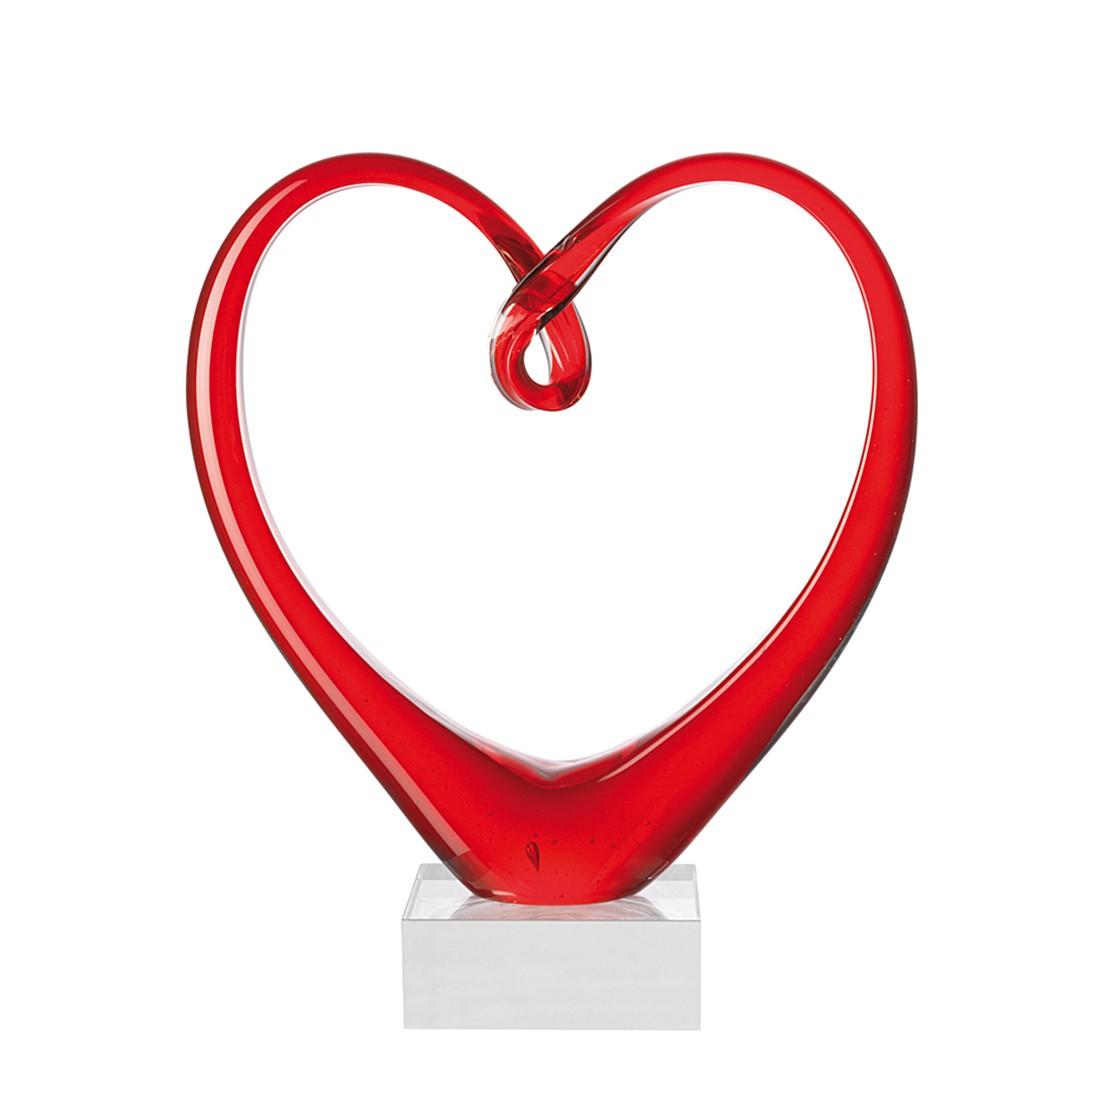 Skulptur Heart, Leonardo